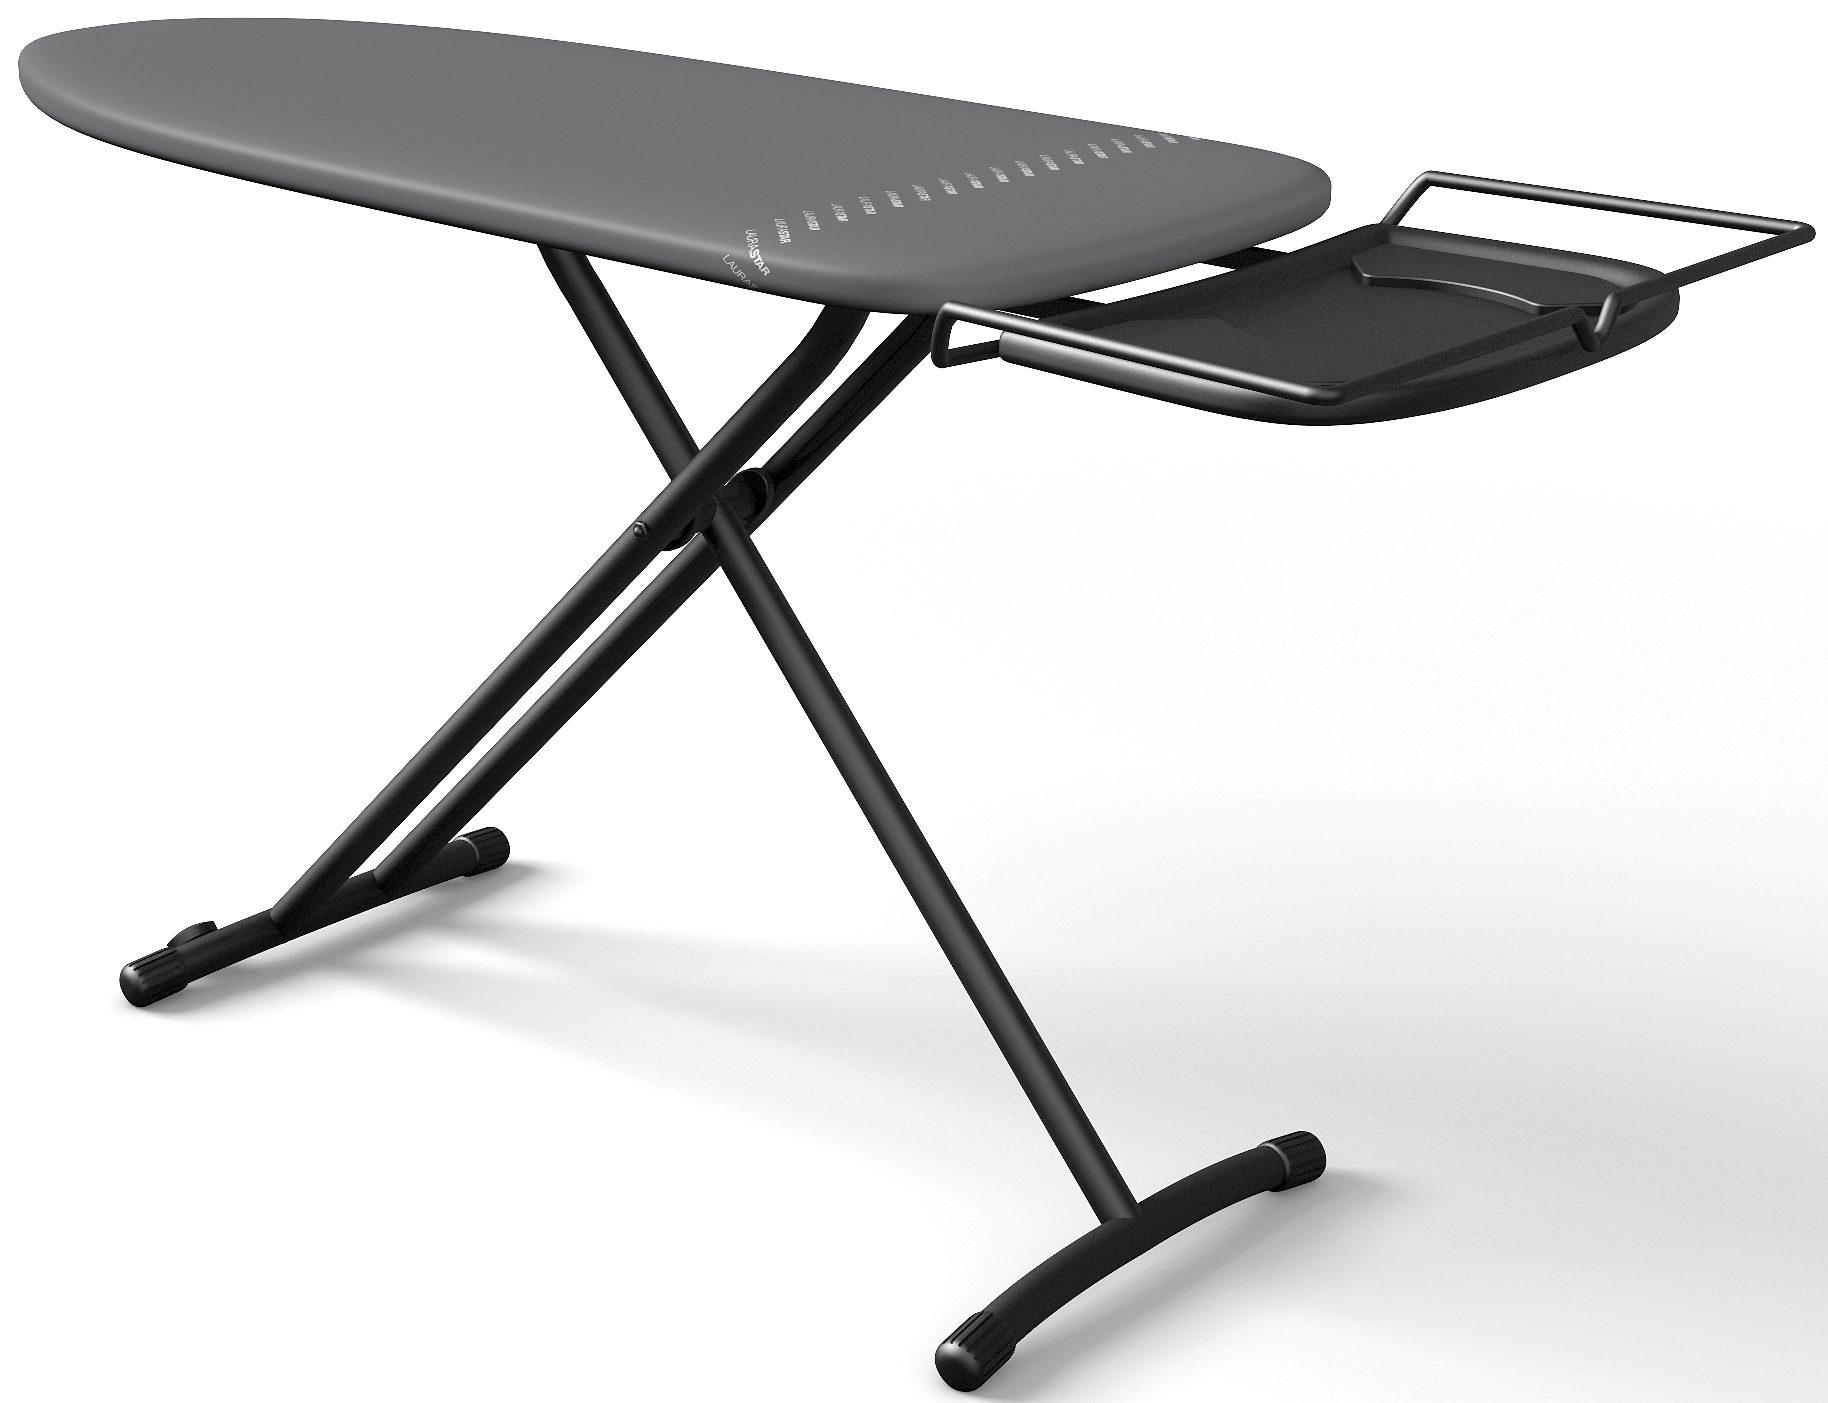 LAURASTAR Bügelbrett PLUSBOARD, Bügelfläsche 125x42 cm, elegantes Design